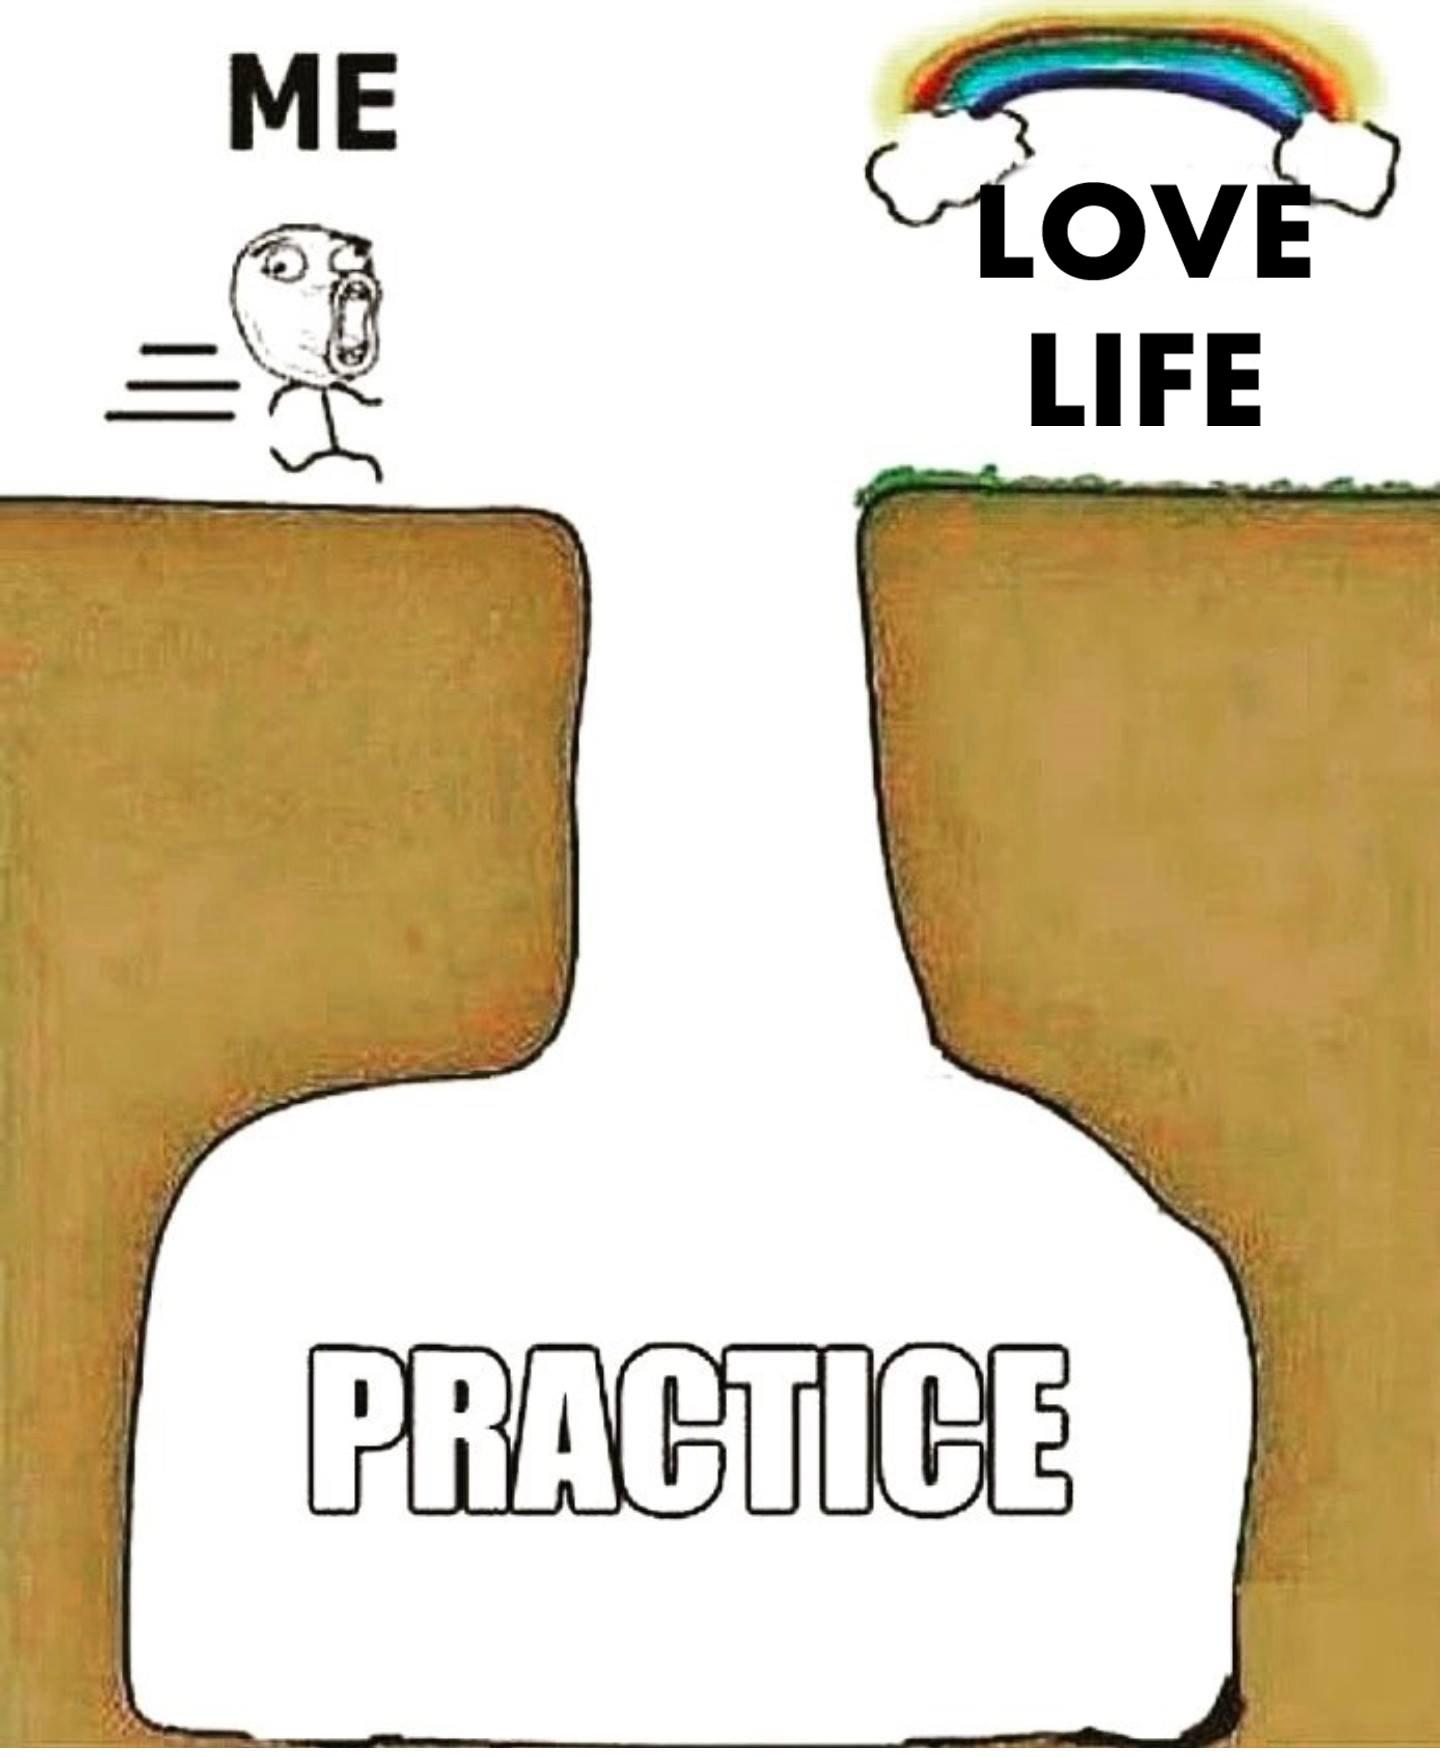 love life practice meme